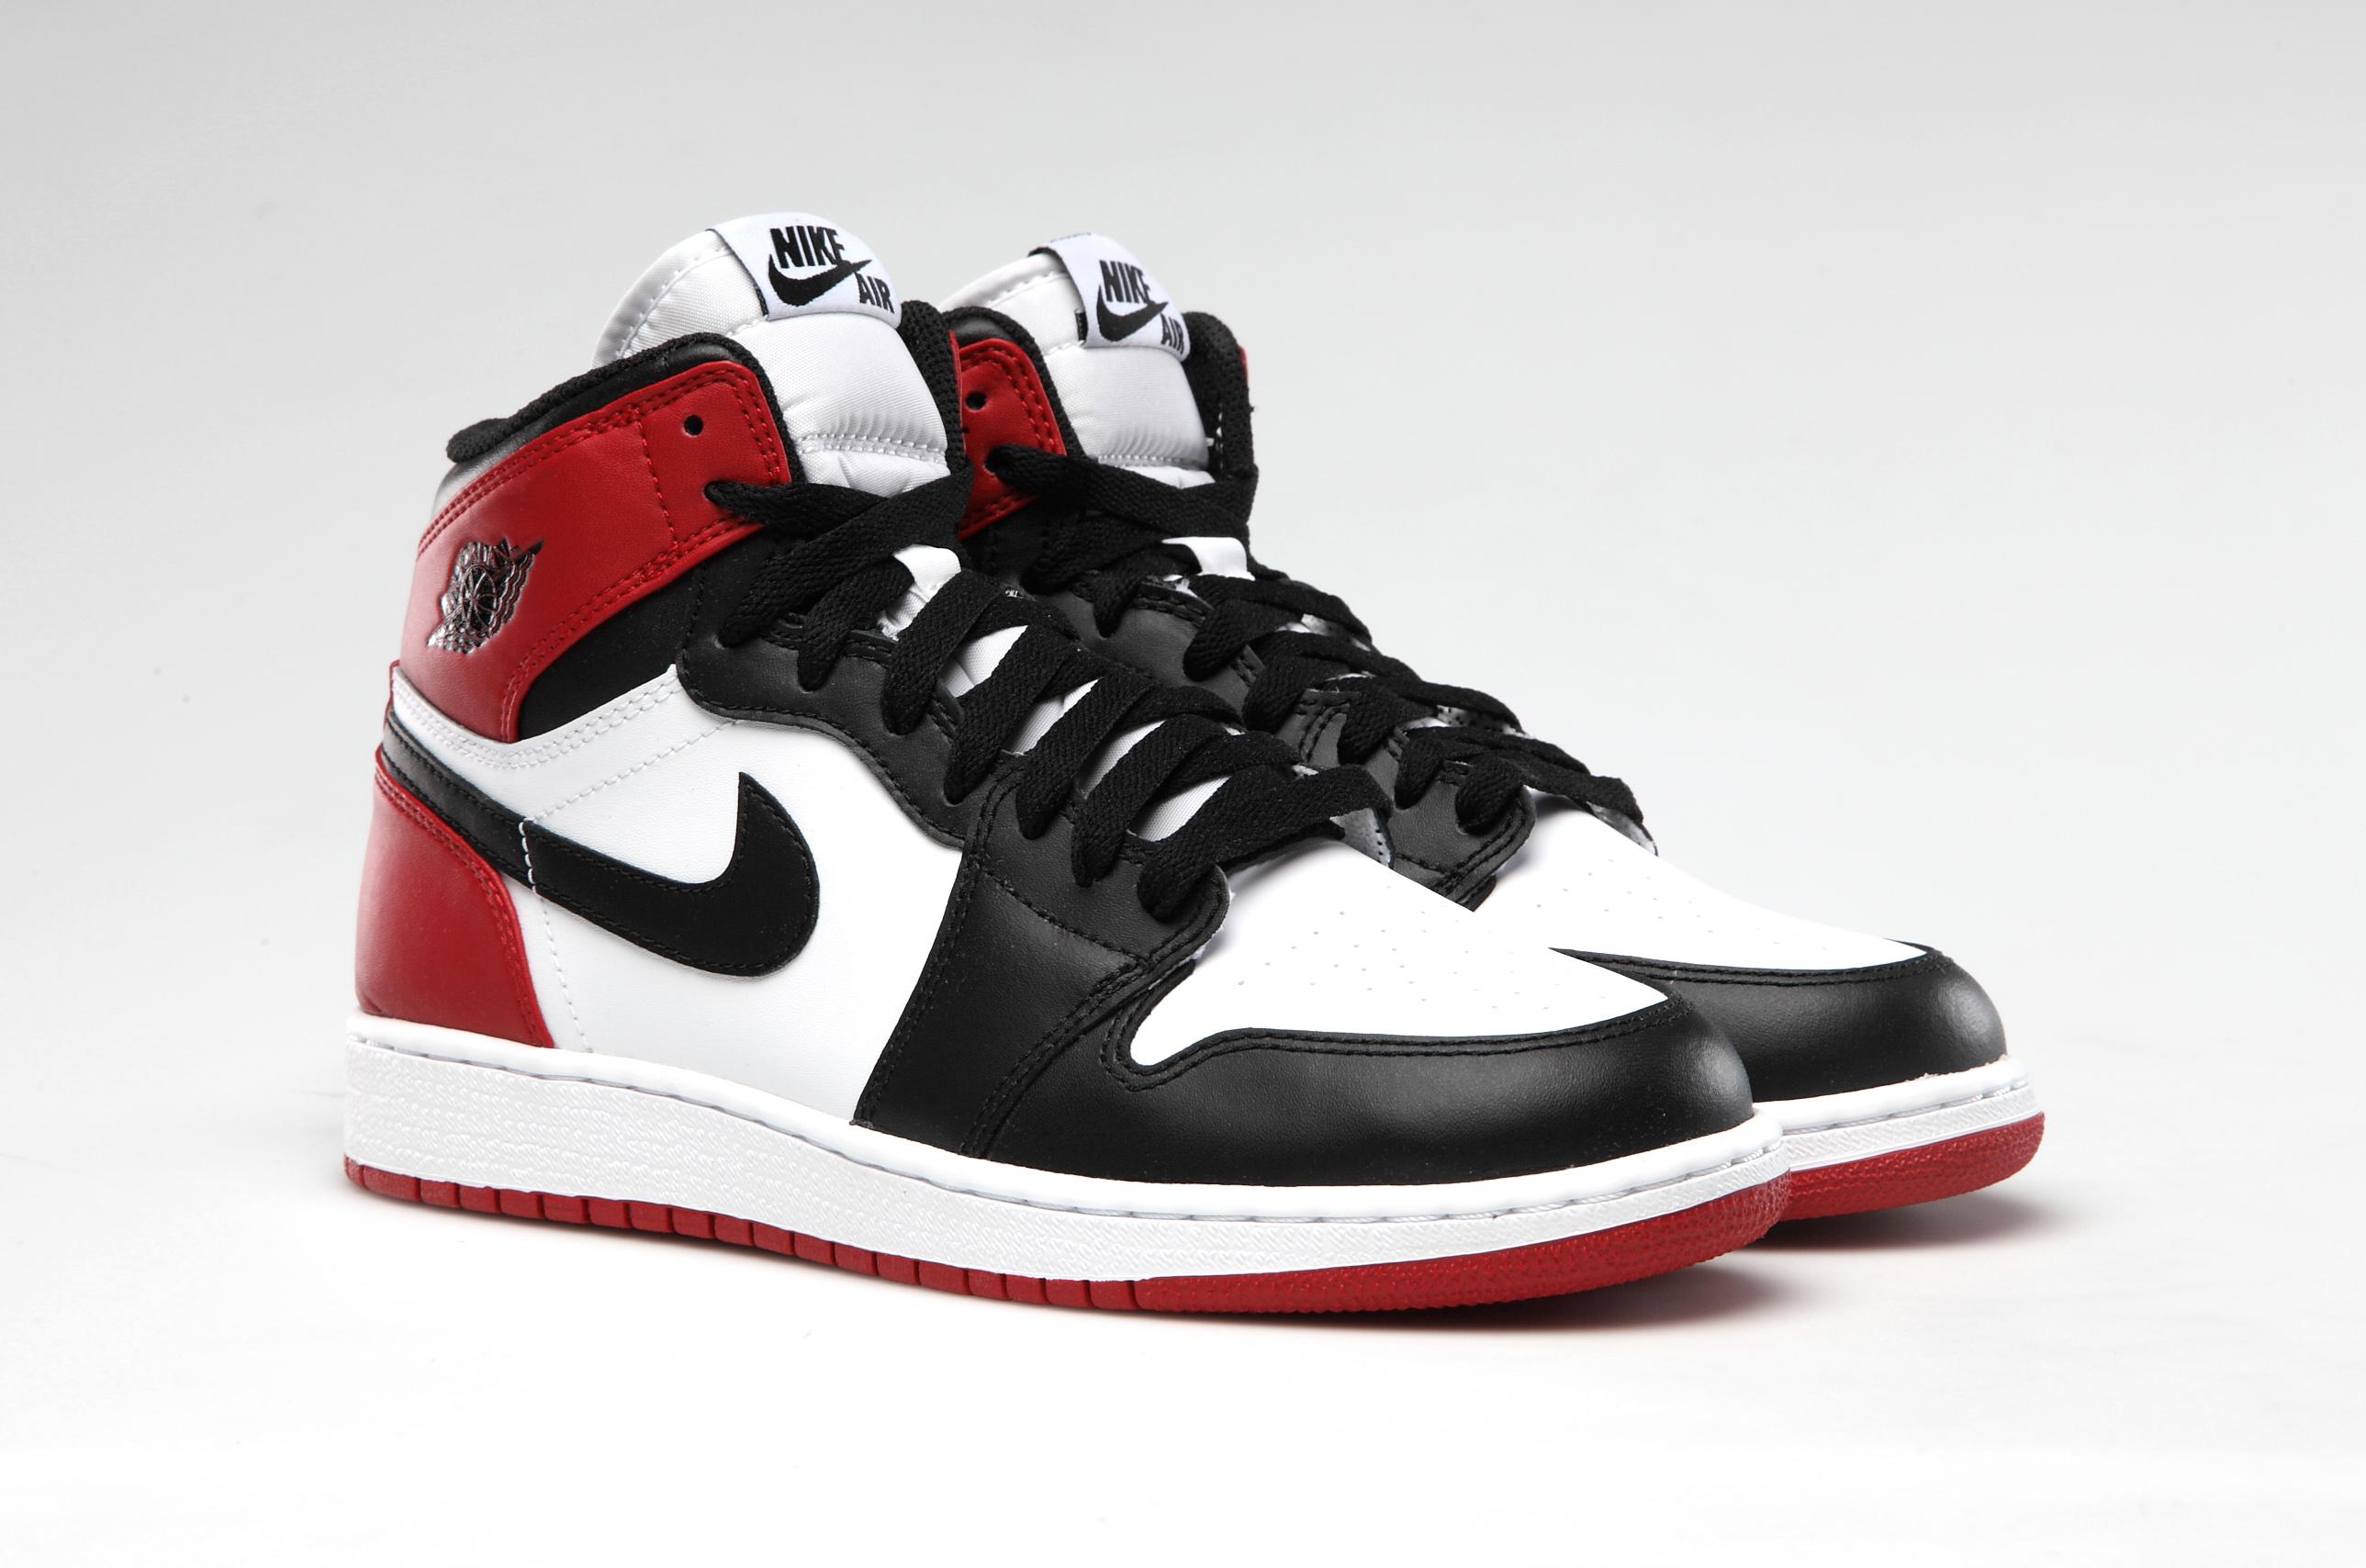 Air Jordan 1 OG 'Black Toe'